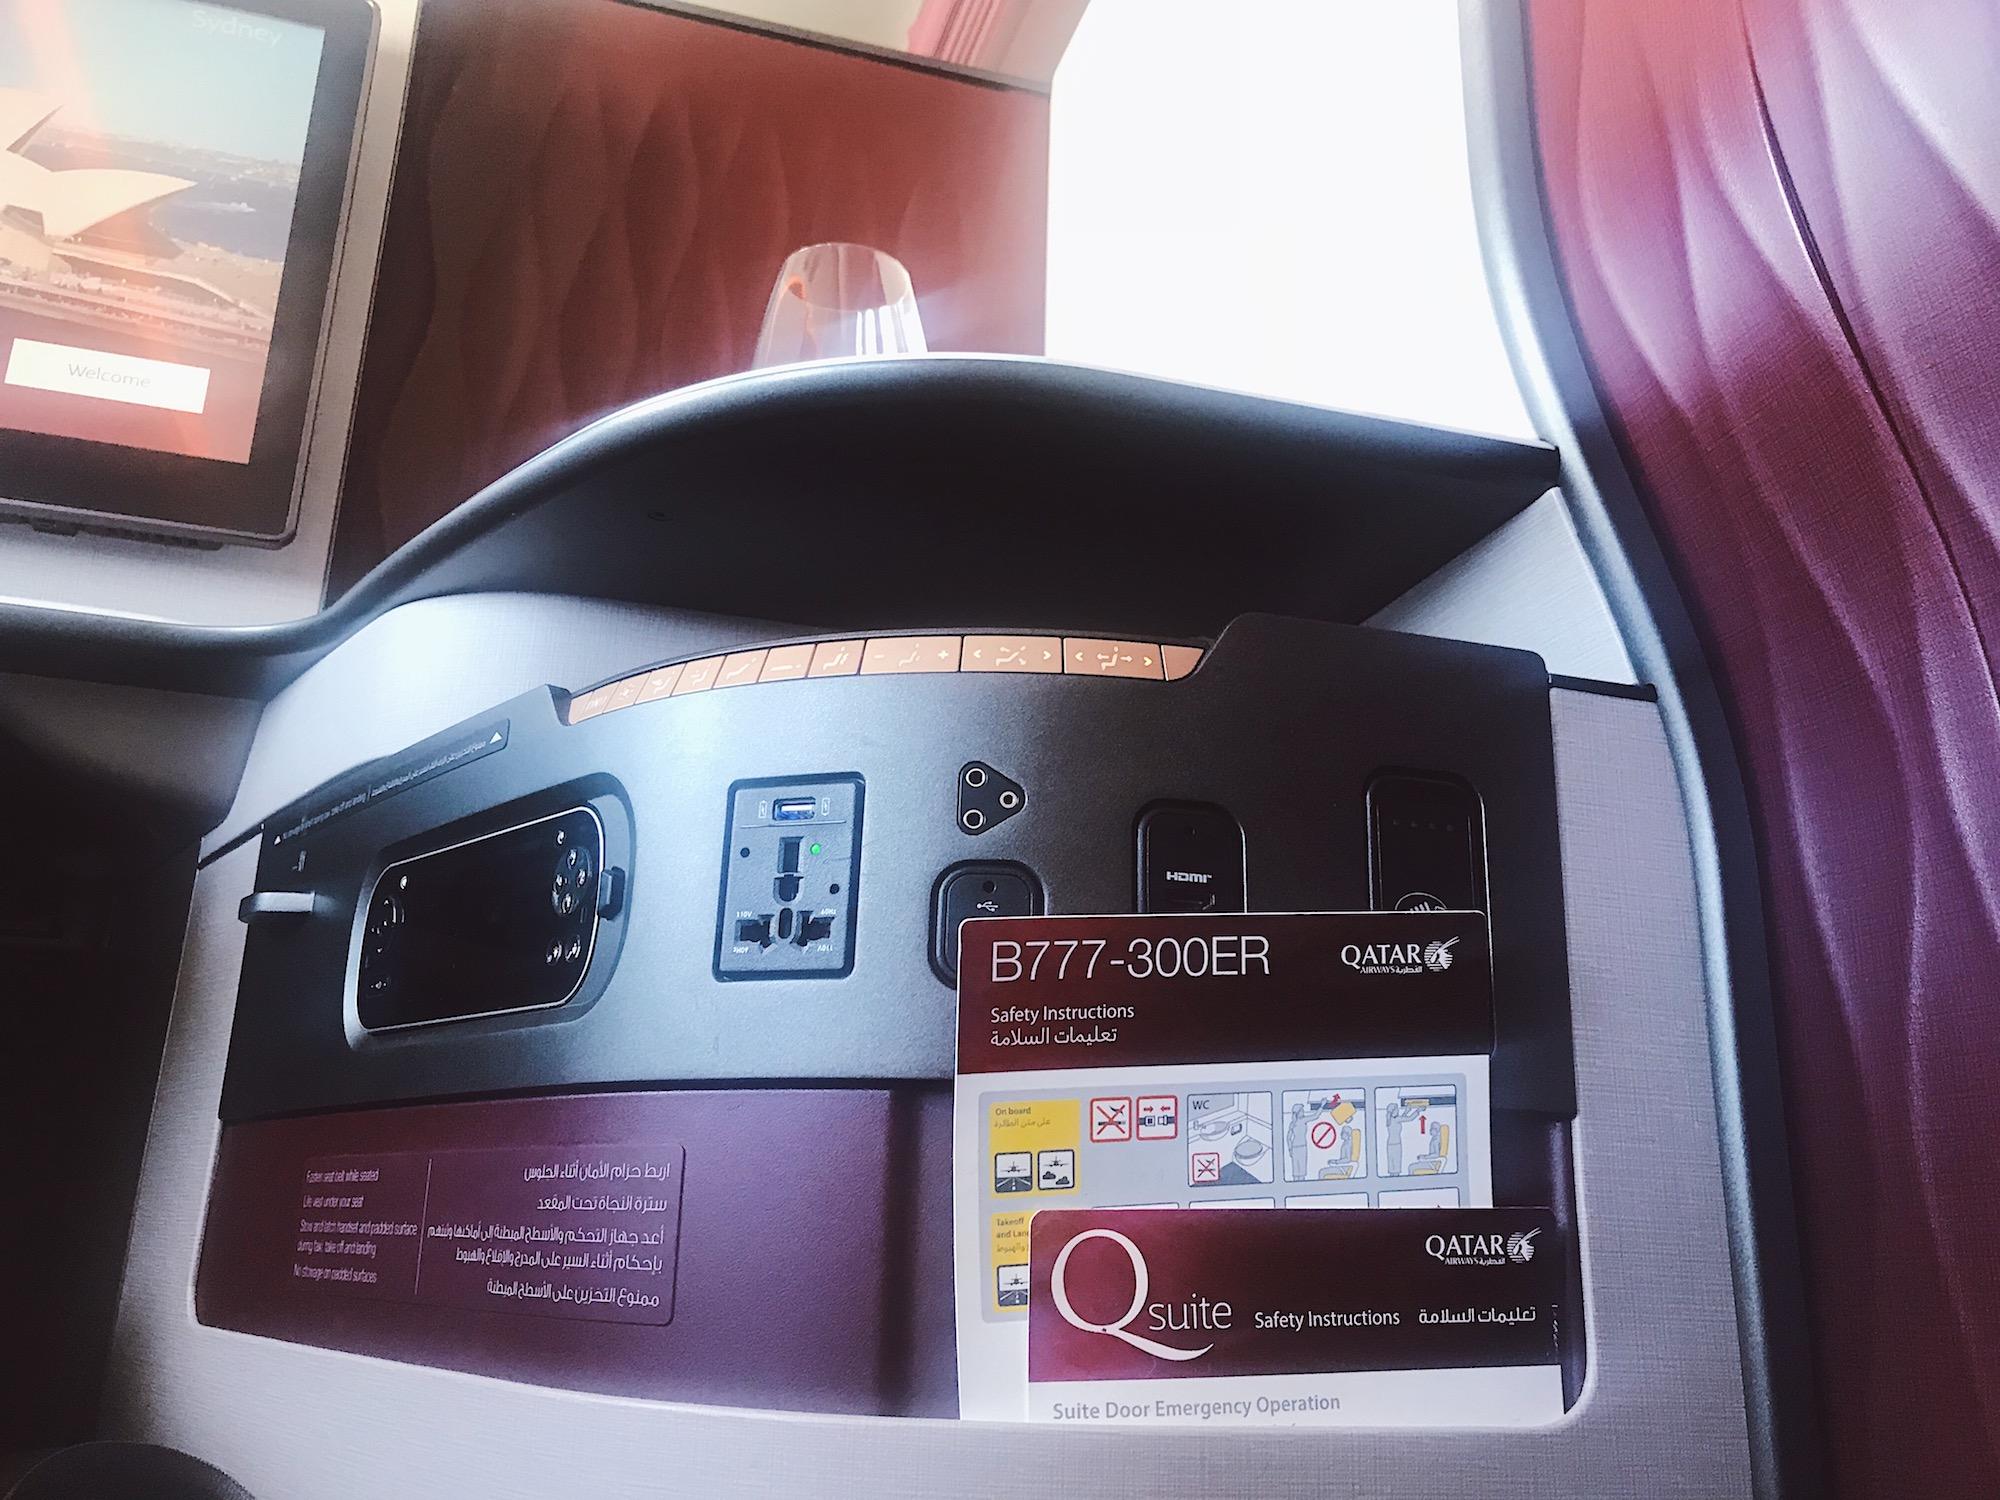 Qatar 777-300ER QSuites